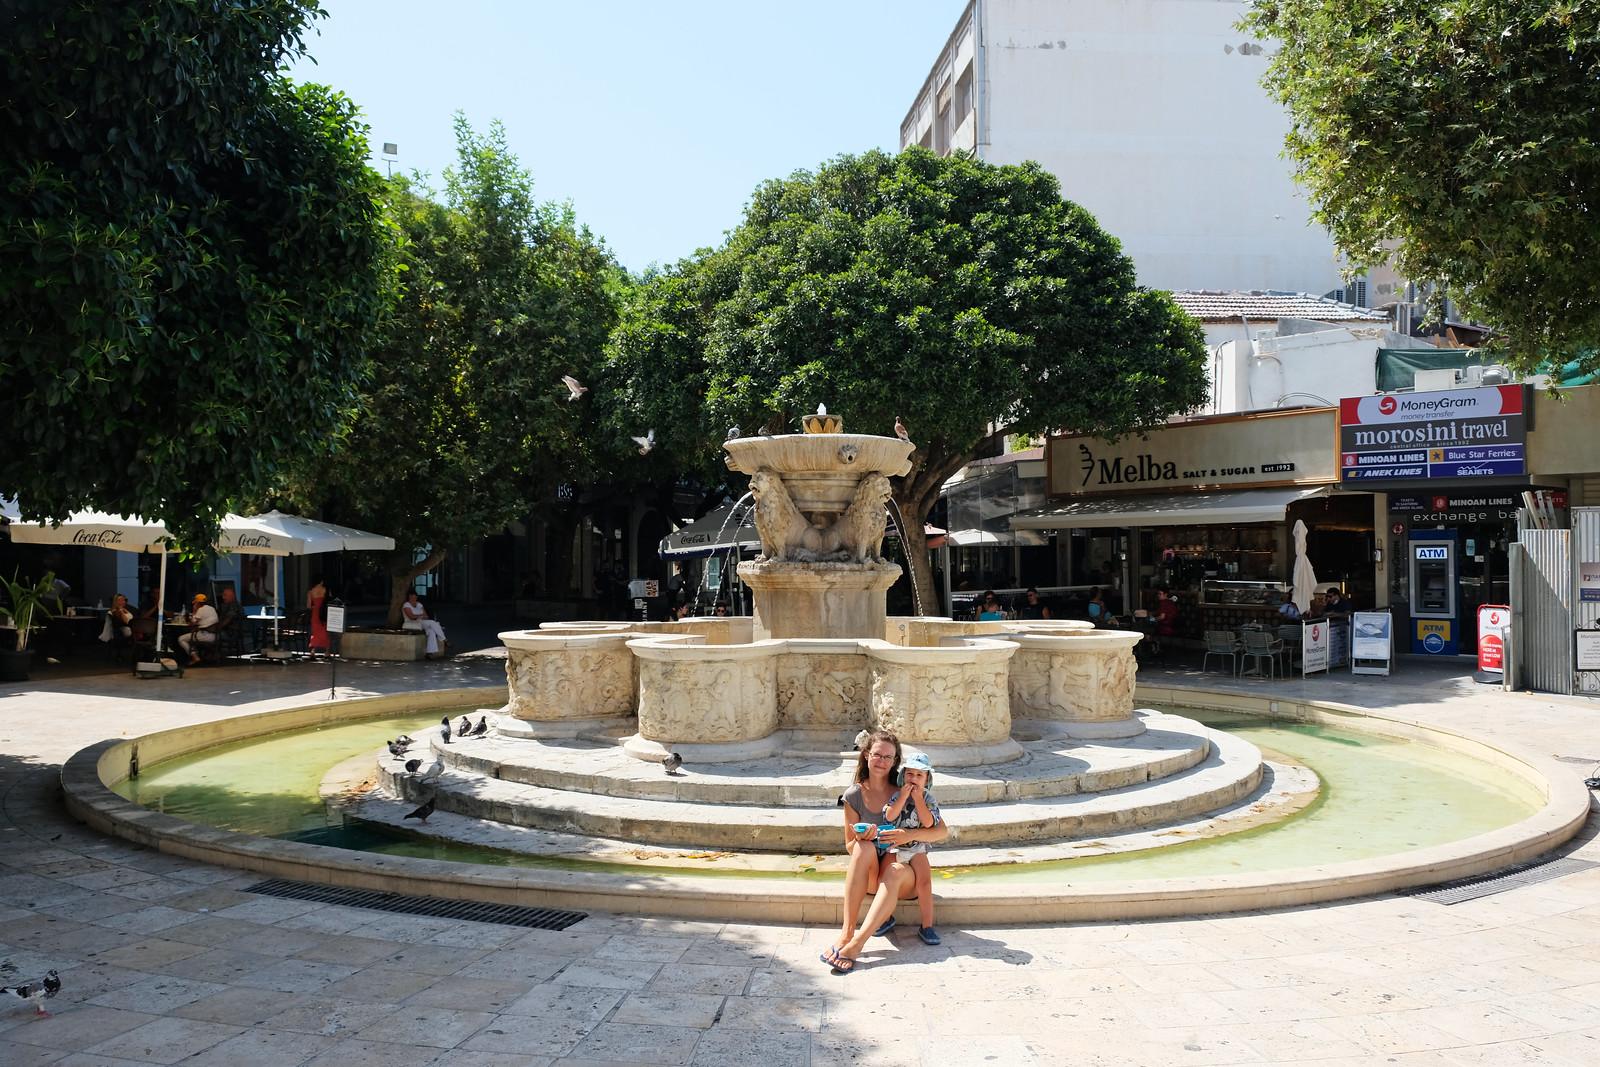 Lions Square, Heraklion, Crete, Greece